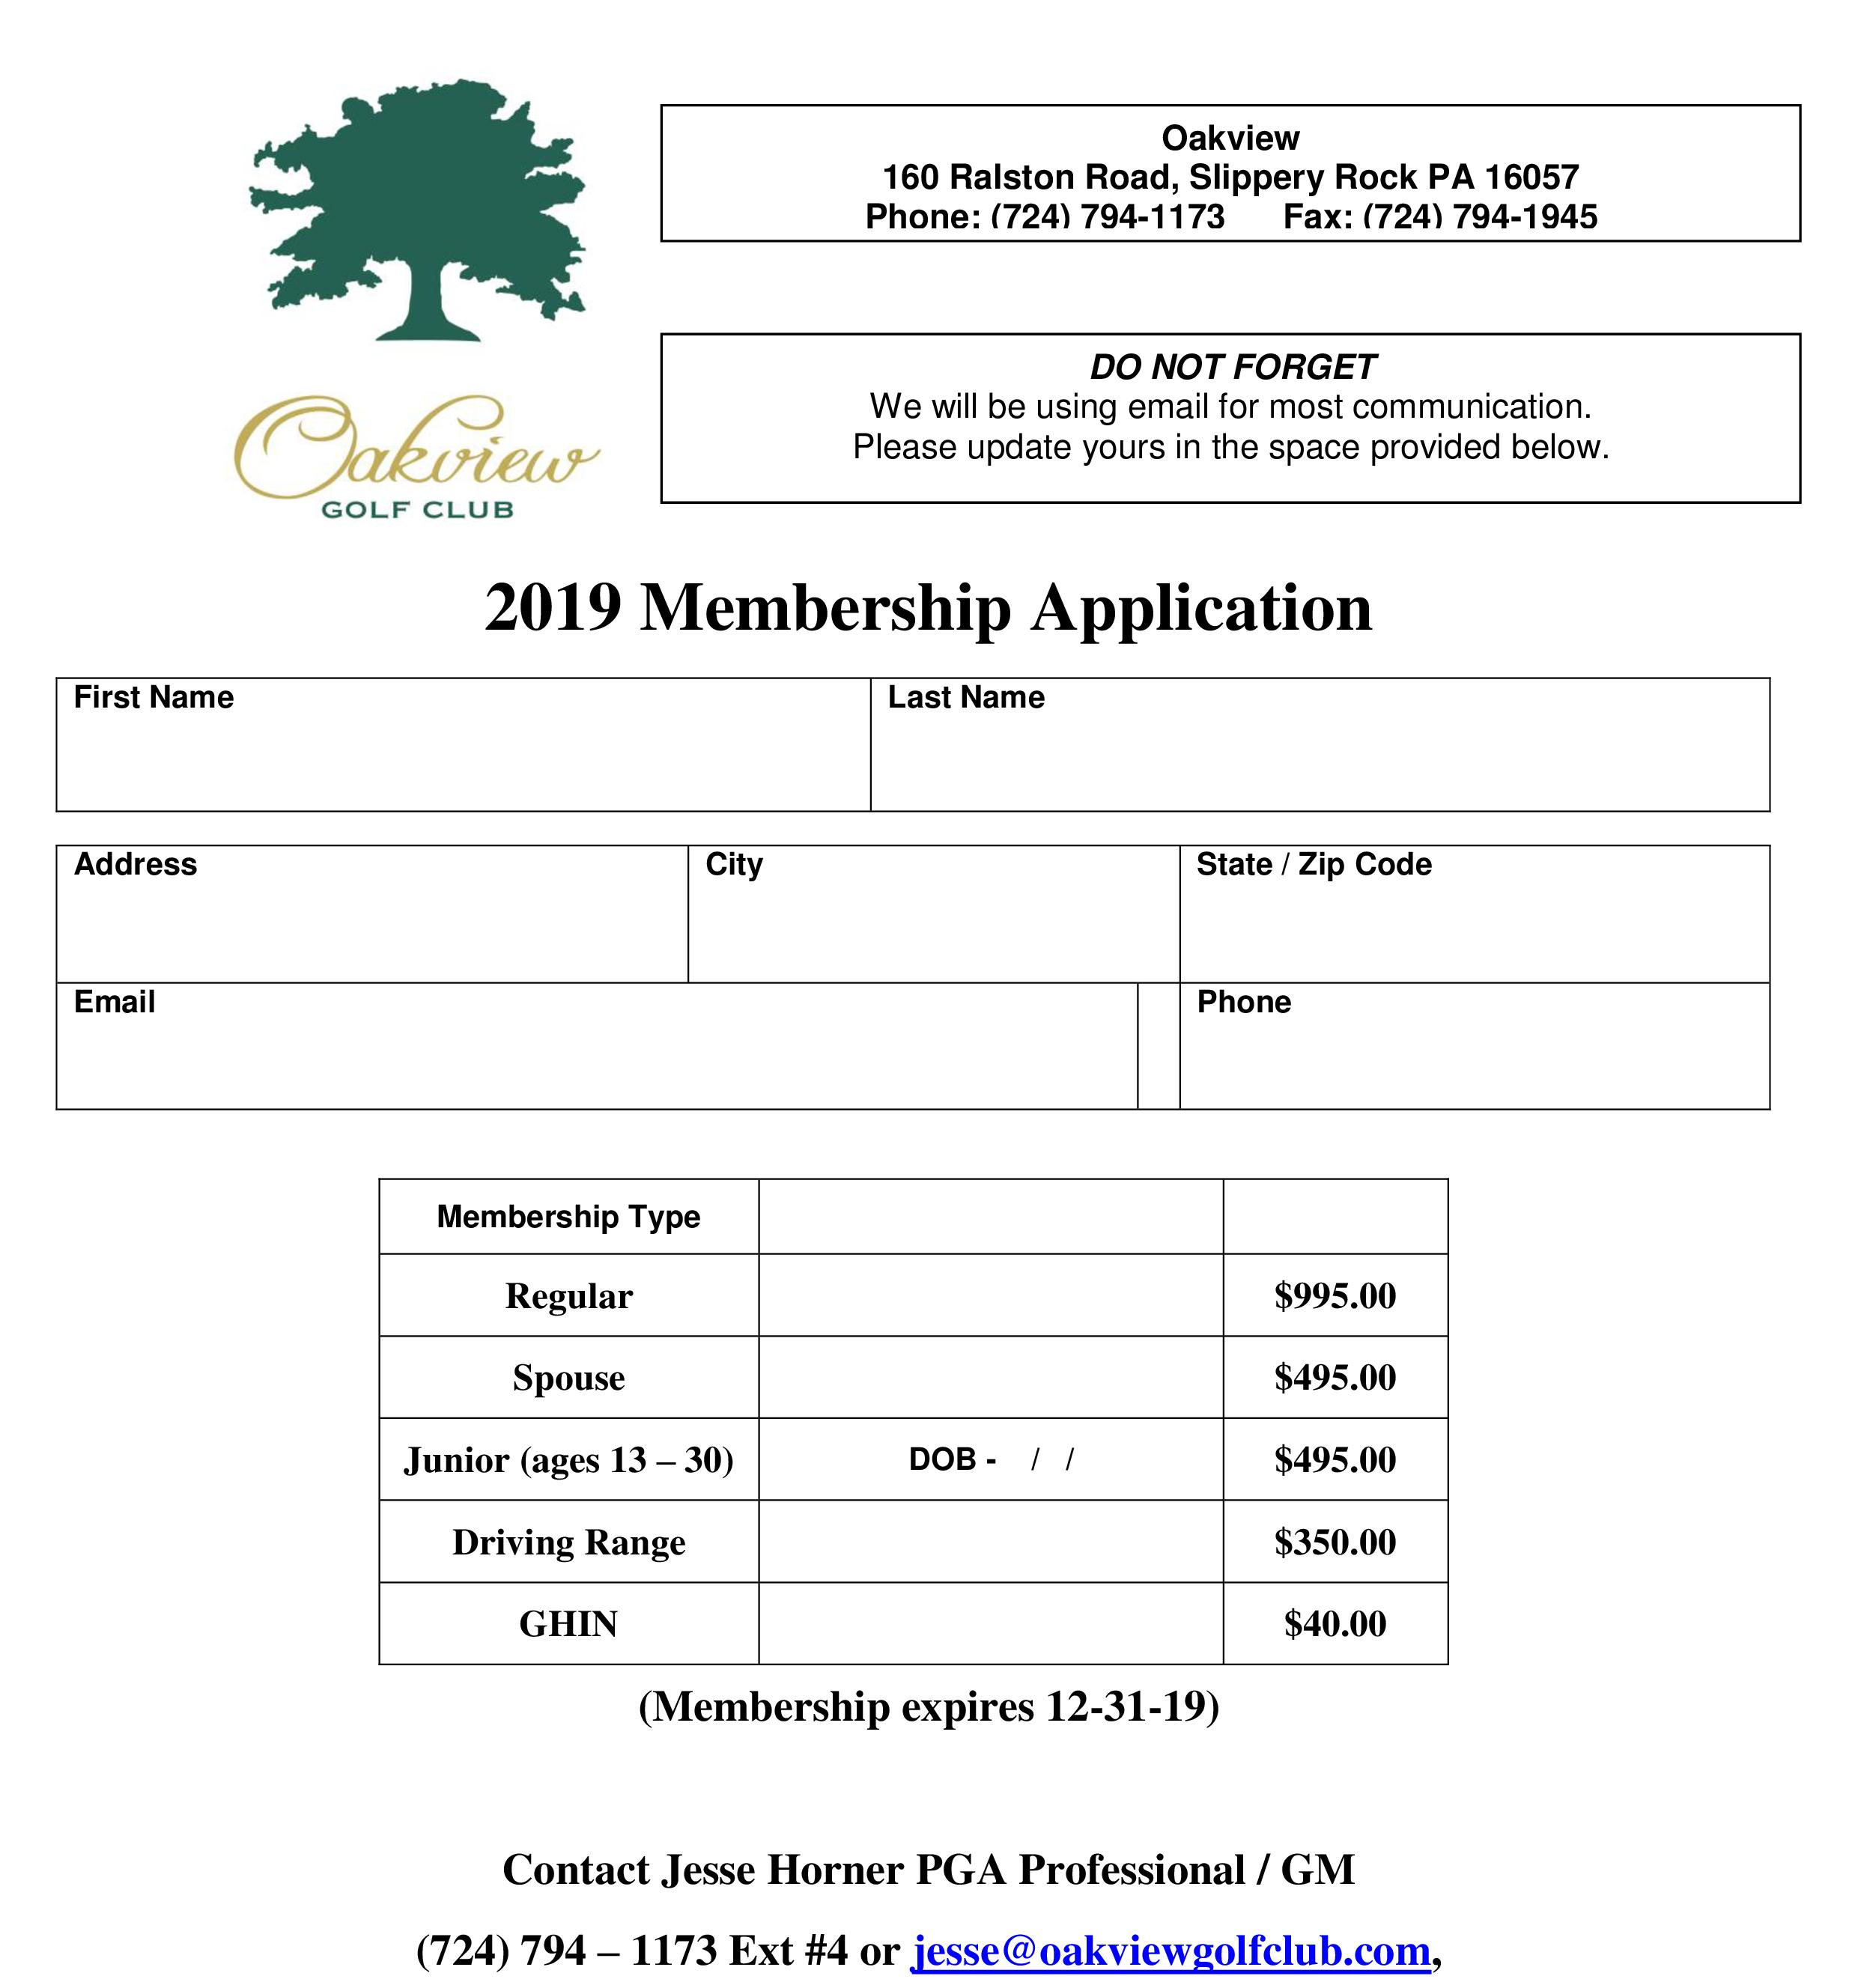 2019 Membership Application